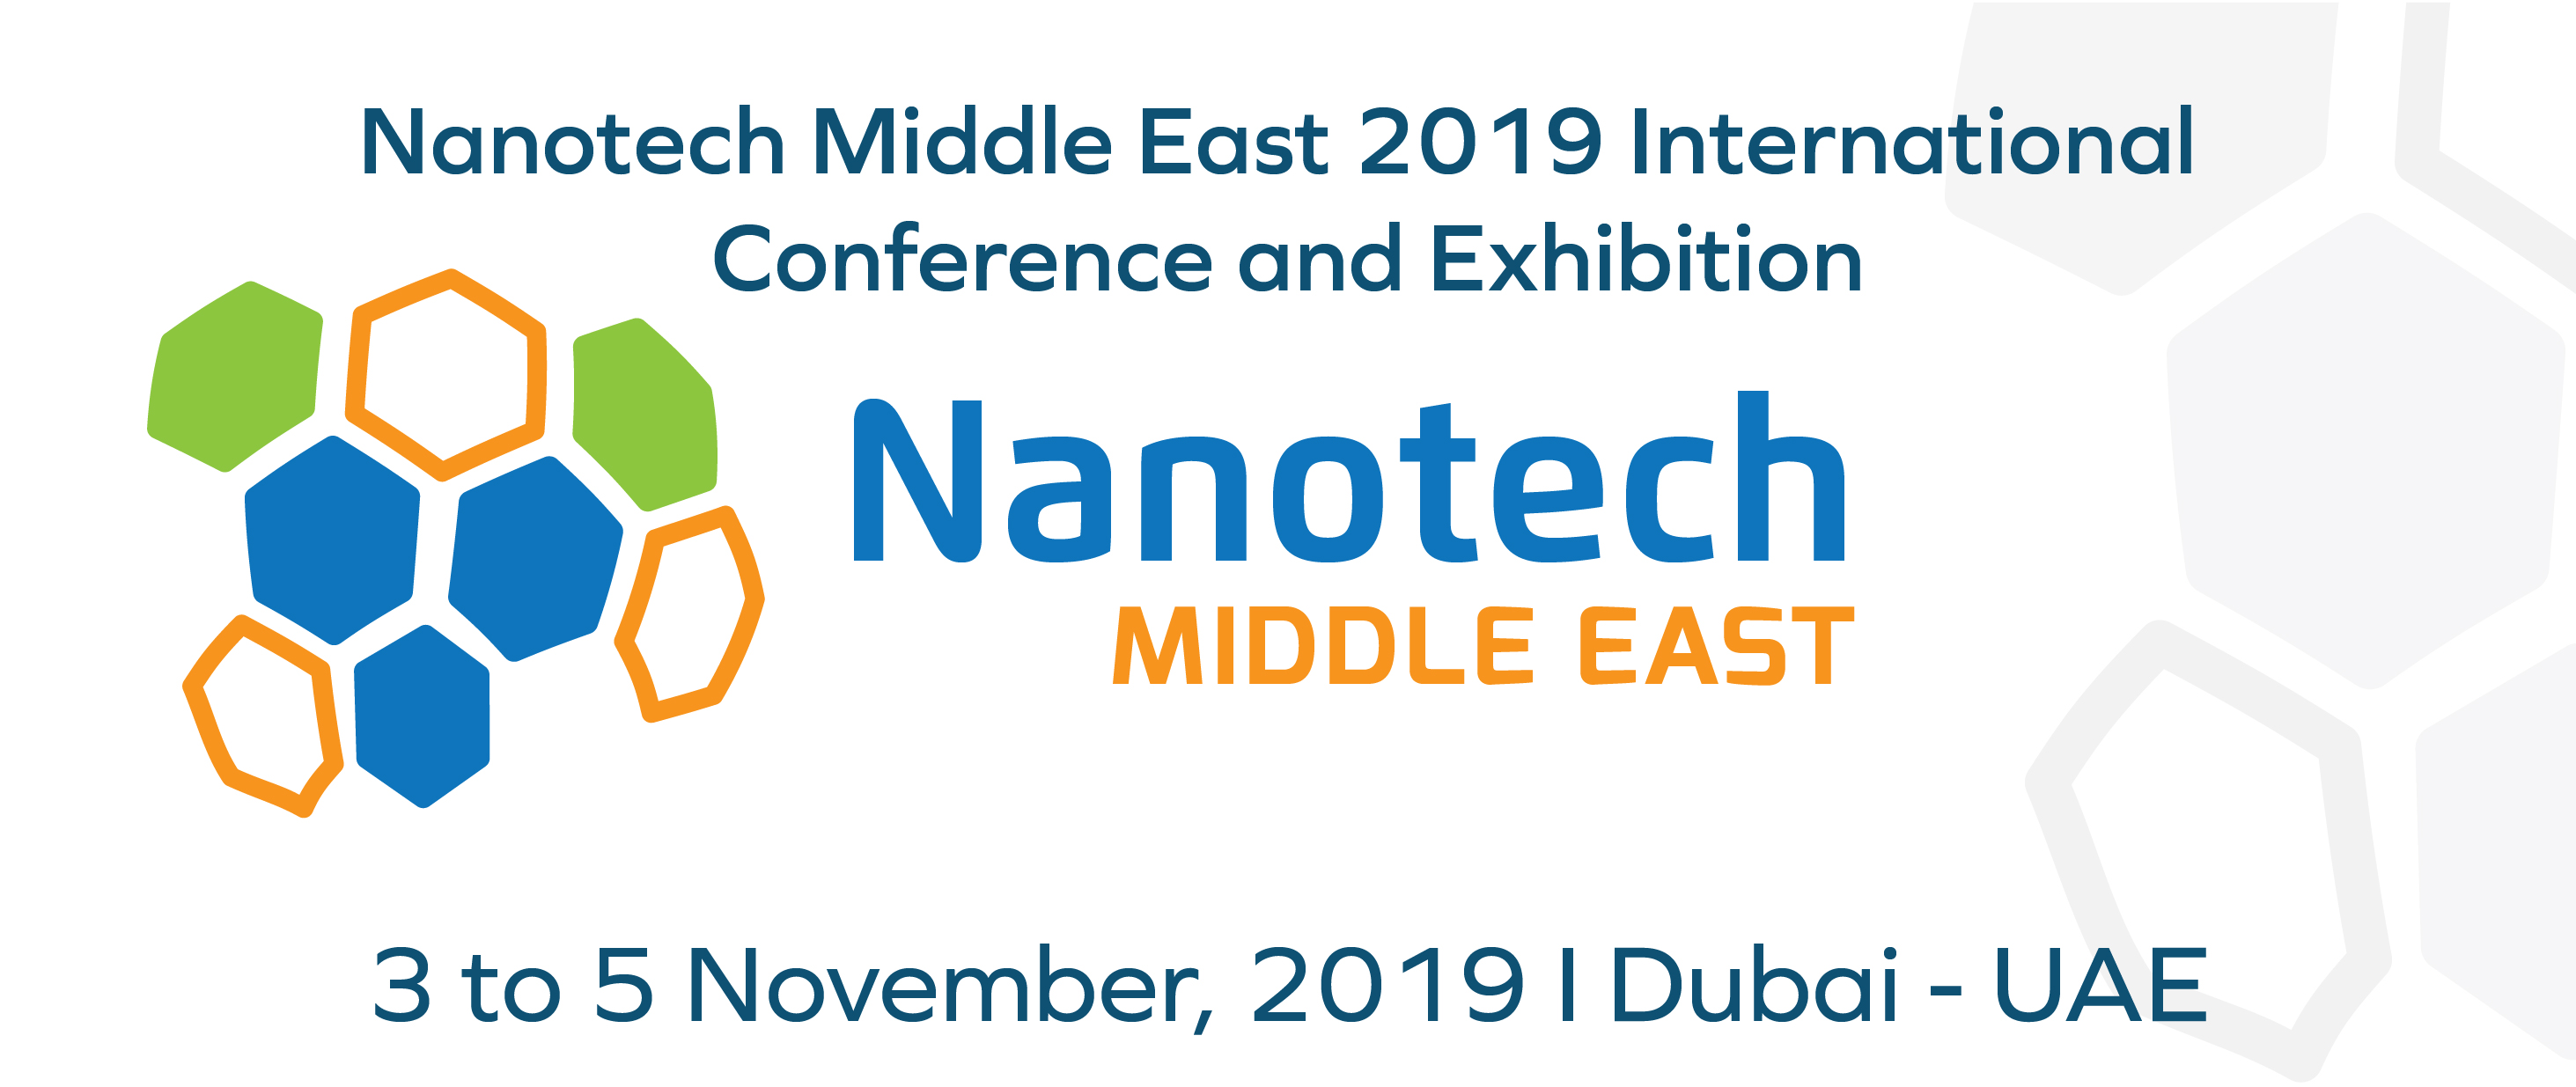 Nanotech Middle East 2019